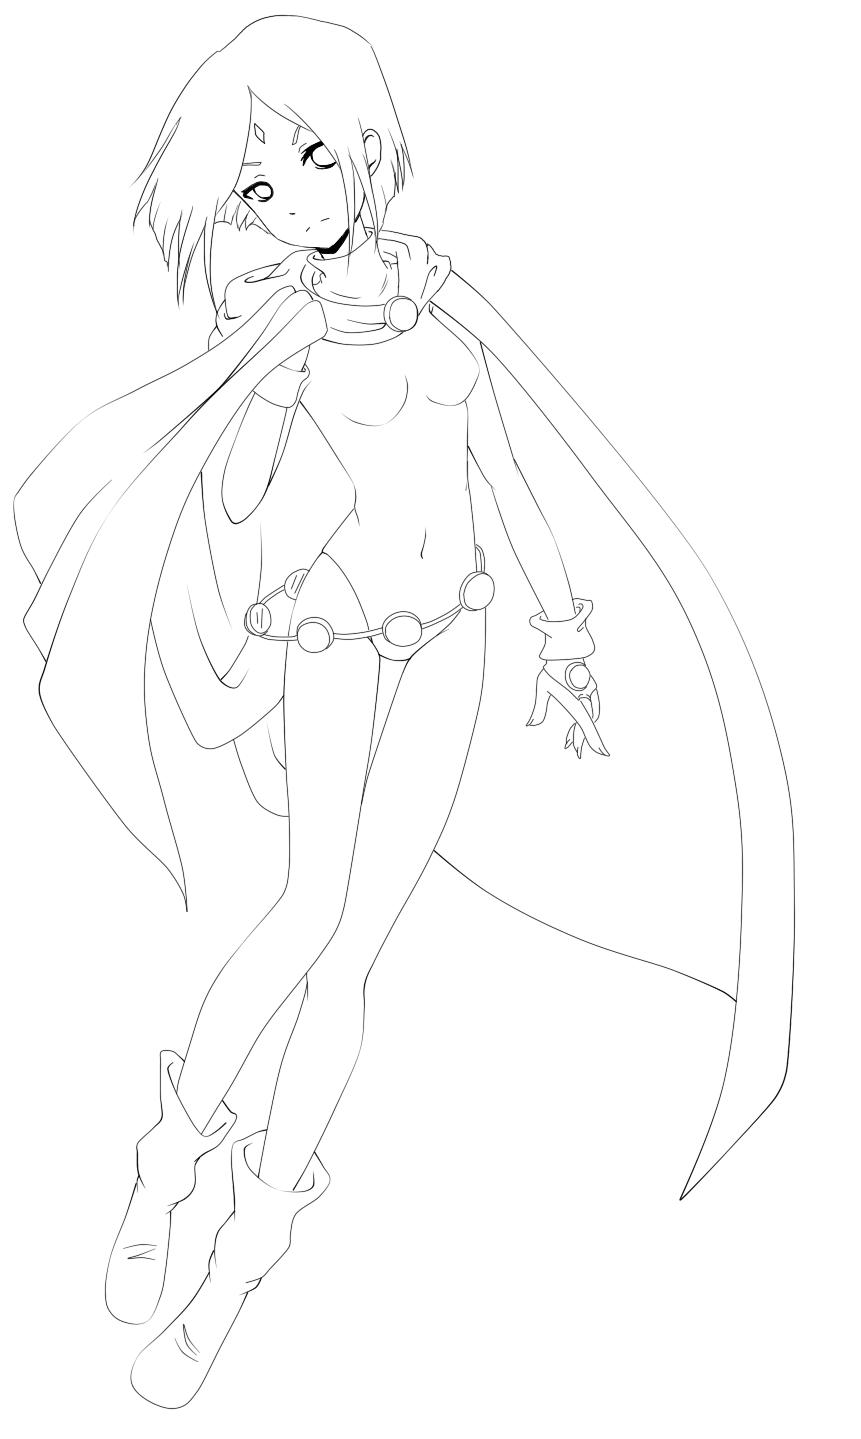 Line Drawing Raven : Raven line art by koike sama on deviantart